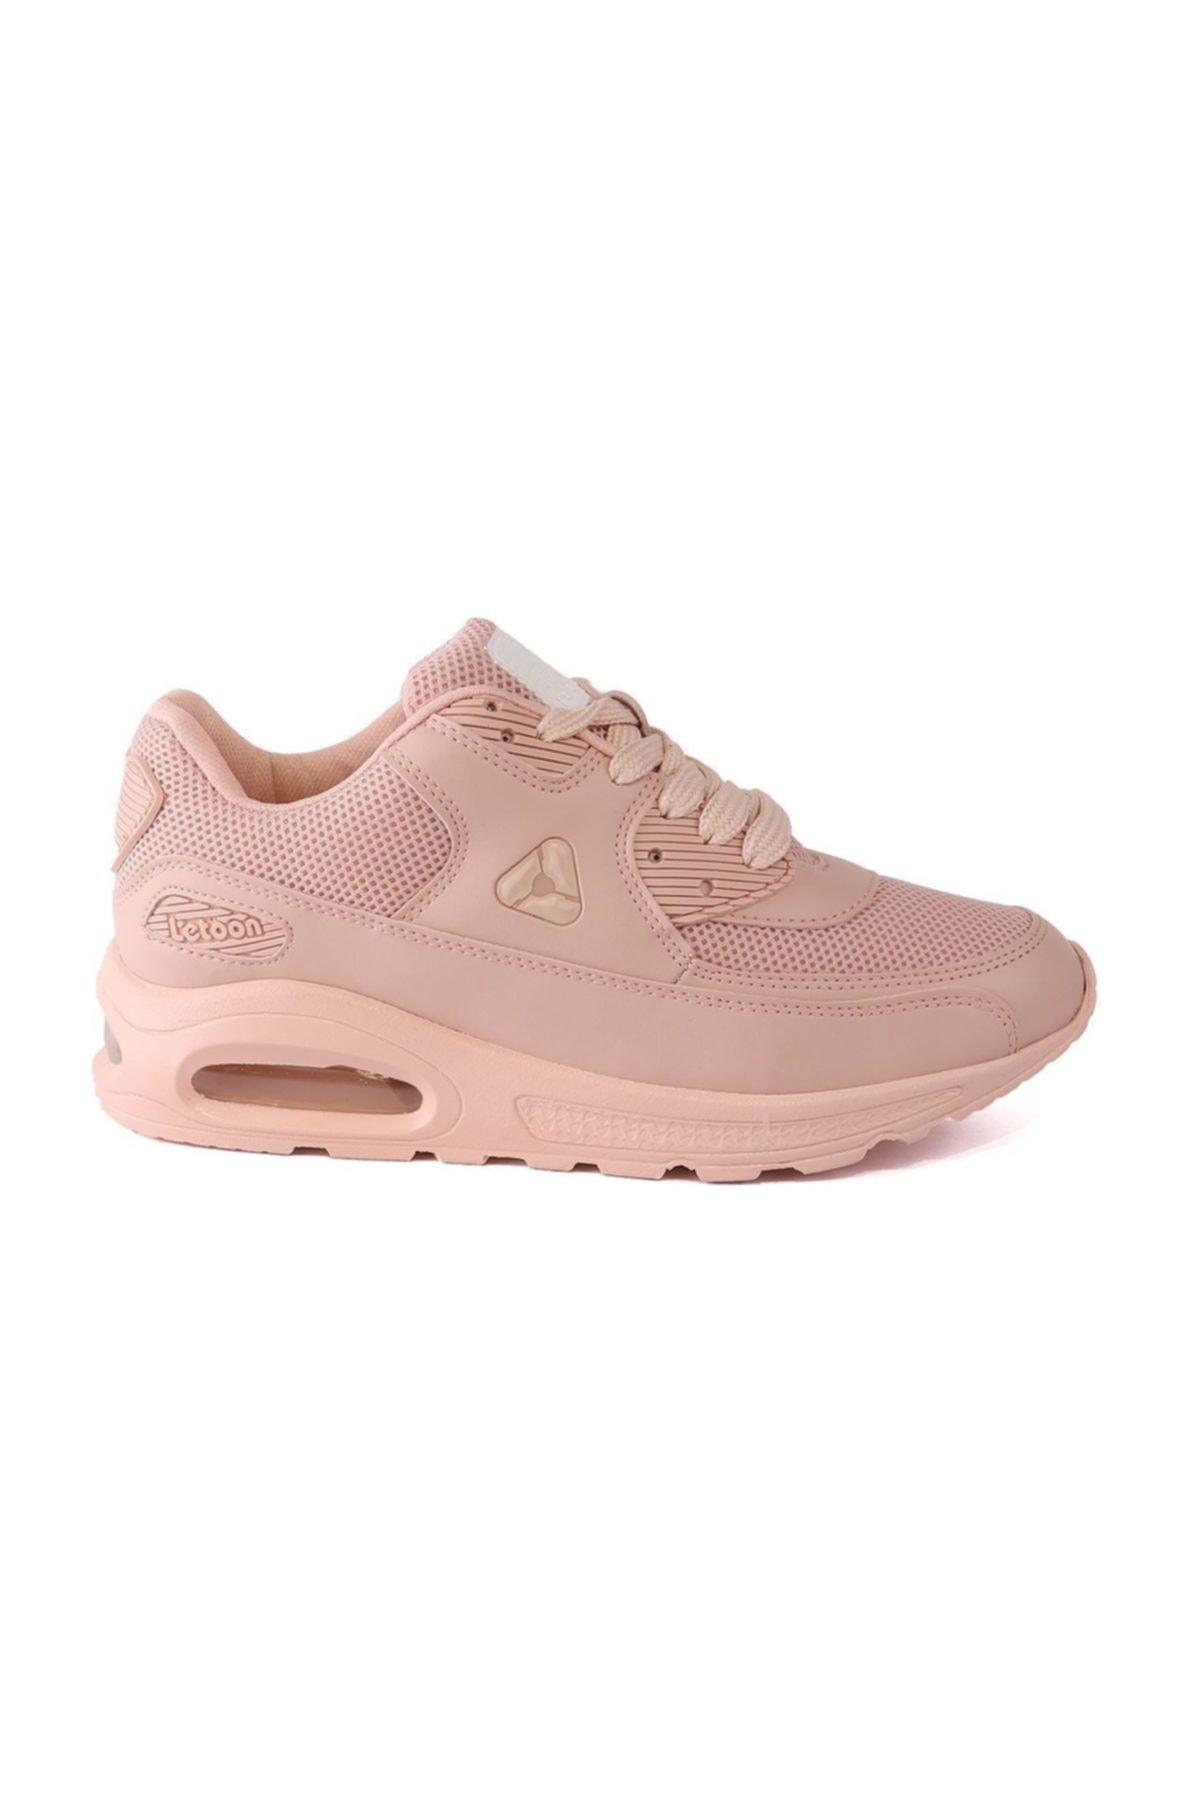 LETOON Kadın Pembe Sneaker - 3103YGR 1